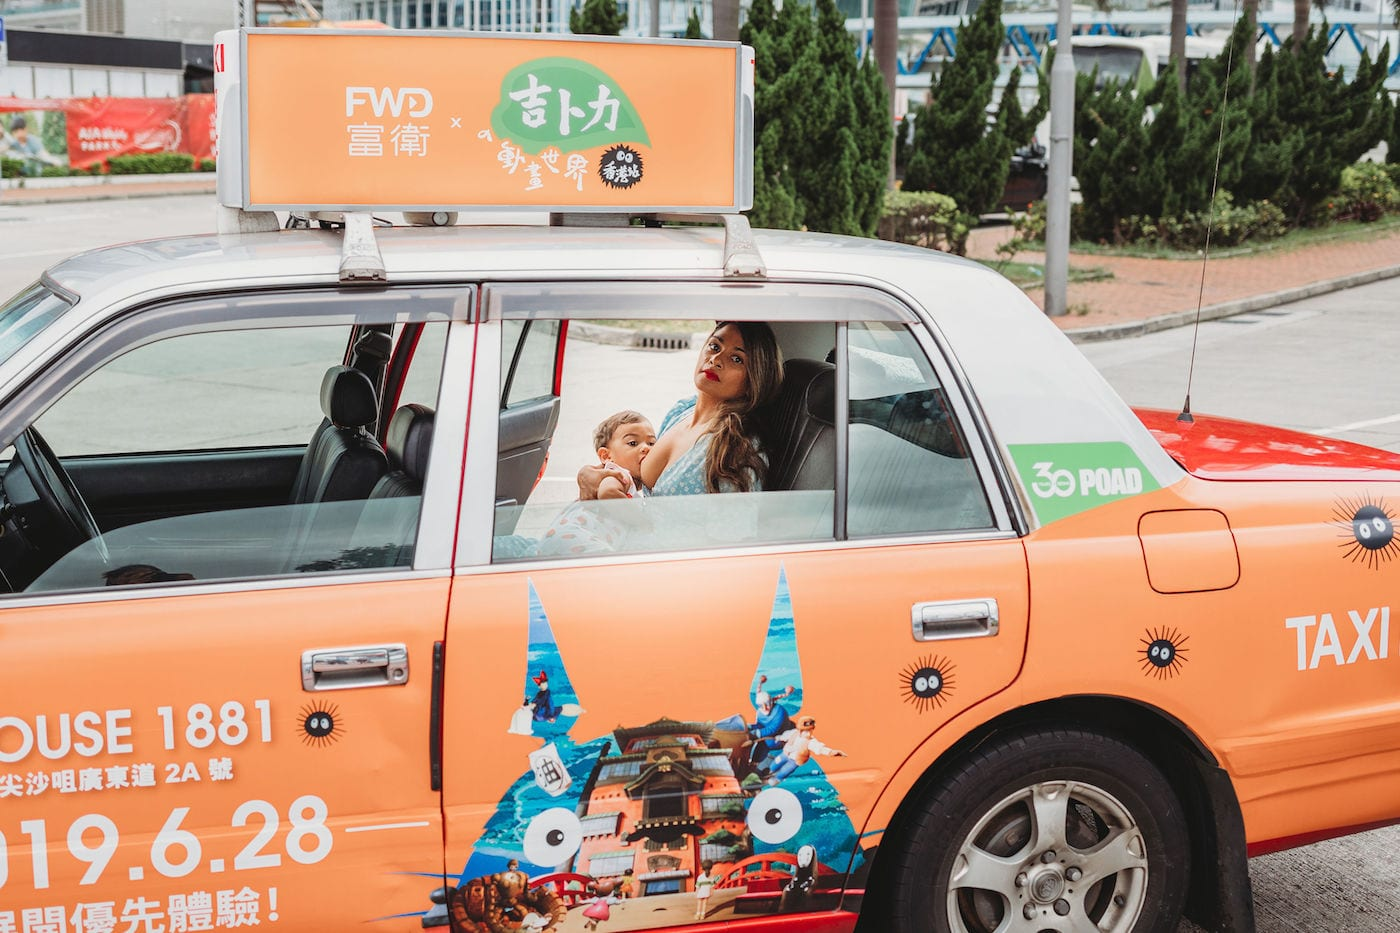 woman breastfeeding in taxi